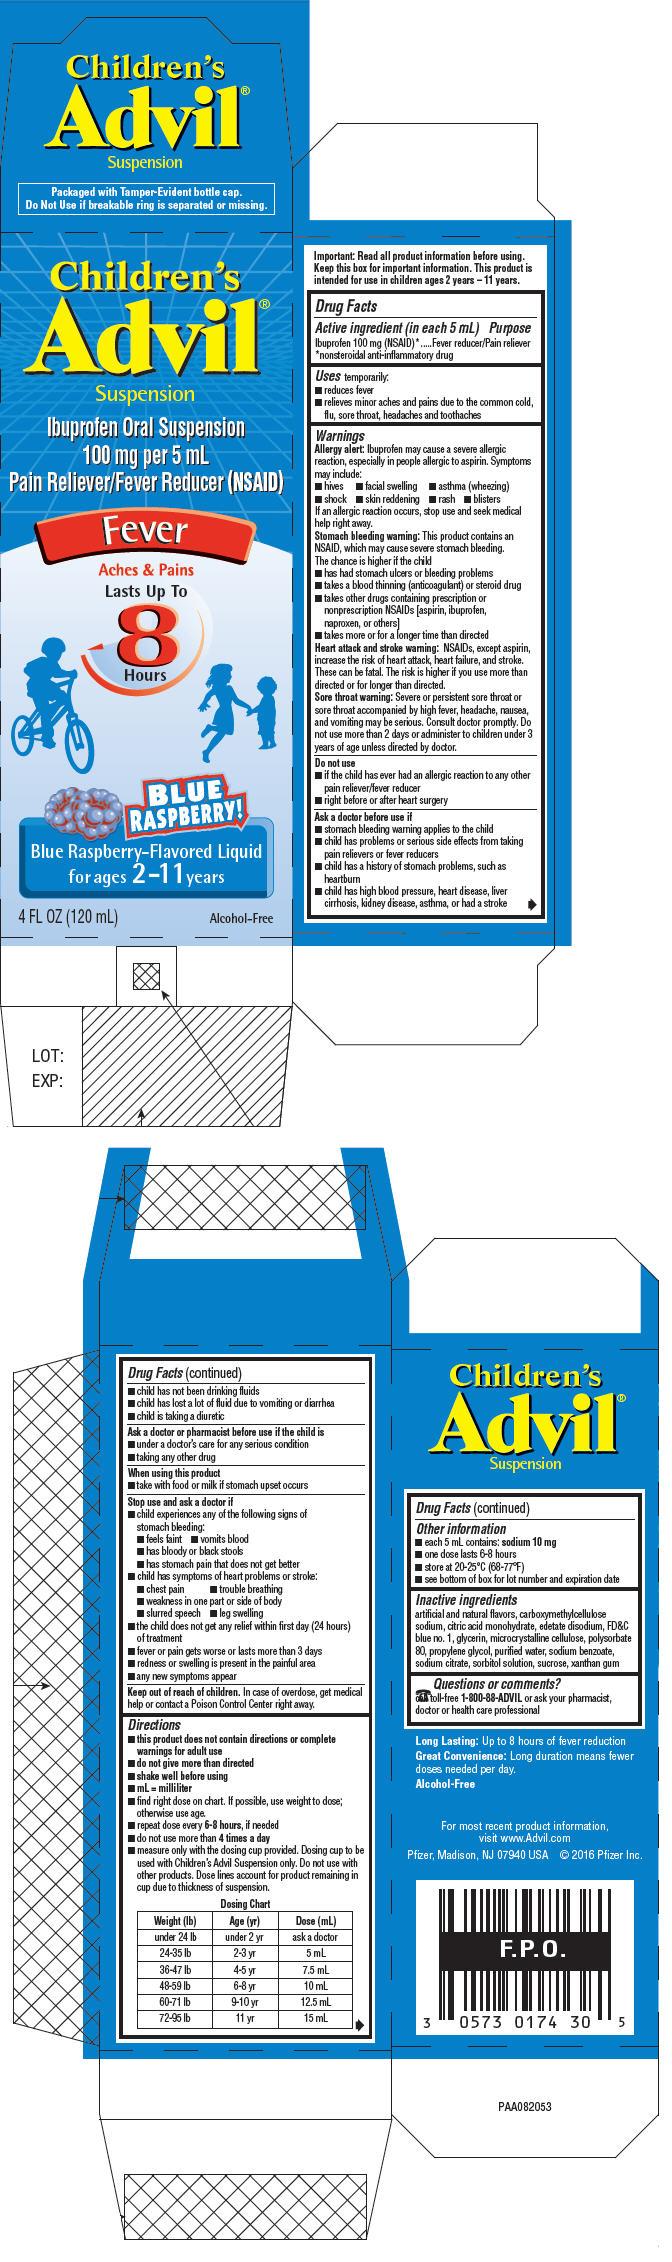 PRINCIPAL DISPLAY PANEL - 120 mL Bottle Carton - Blue Raspberry-Flavored